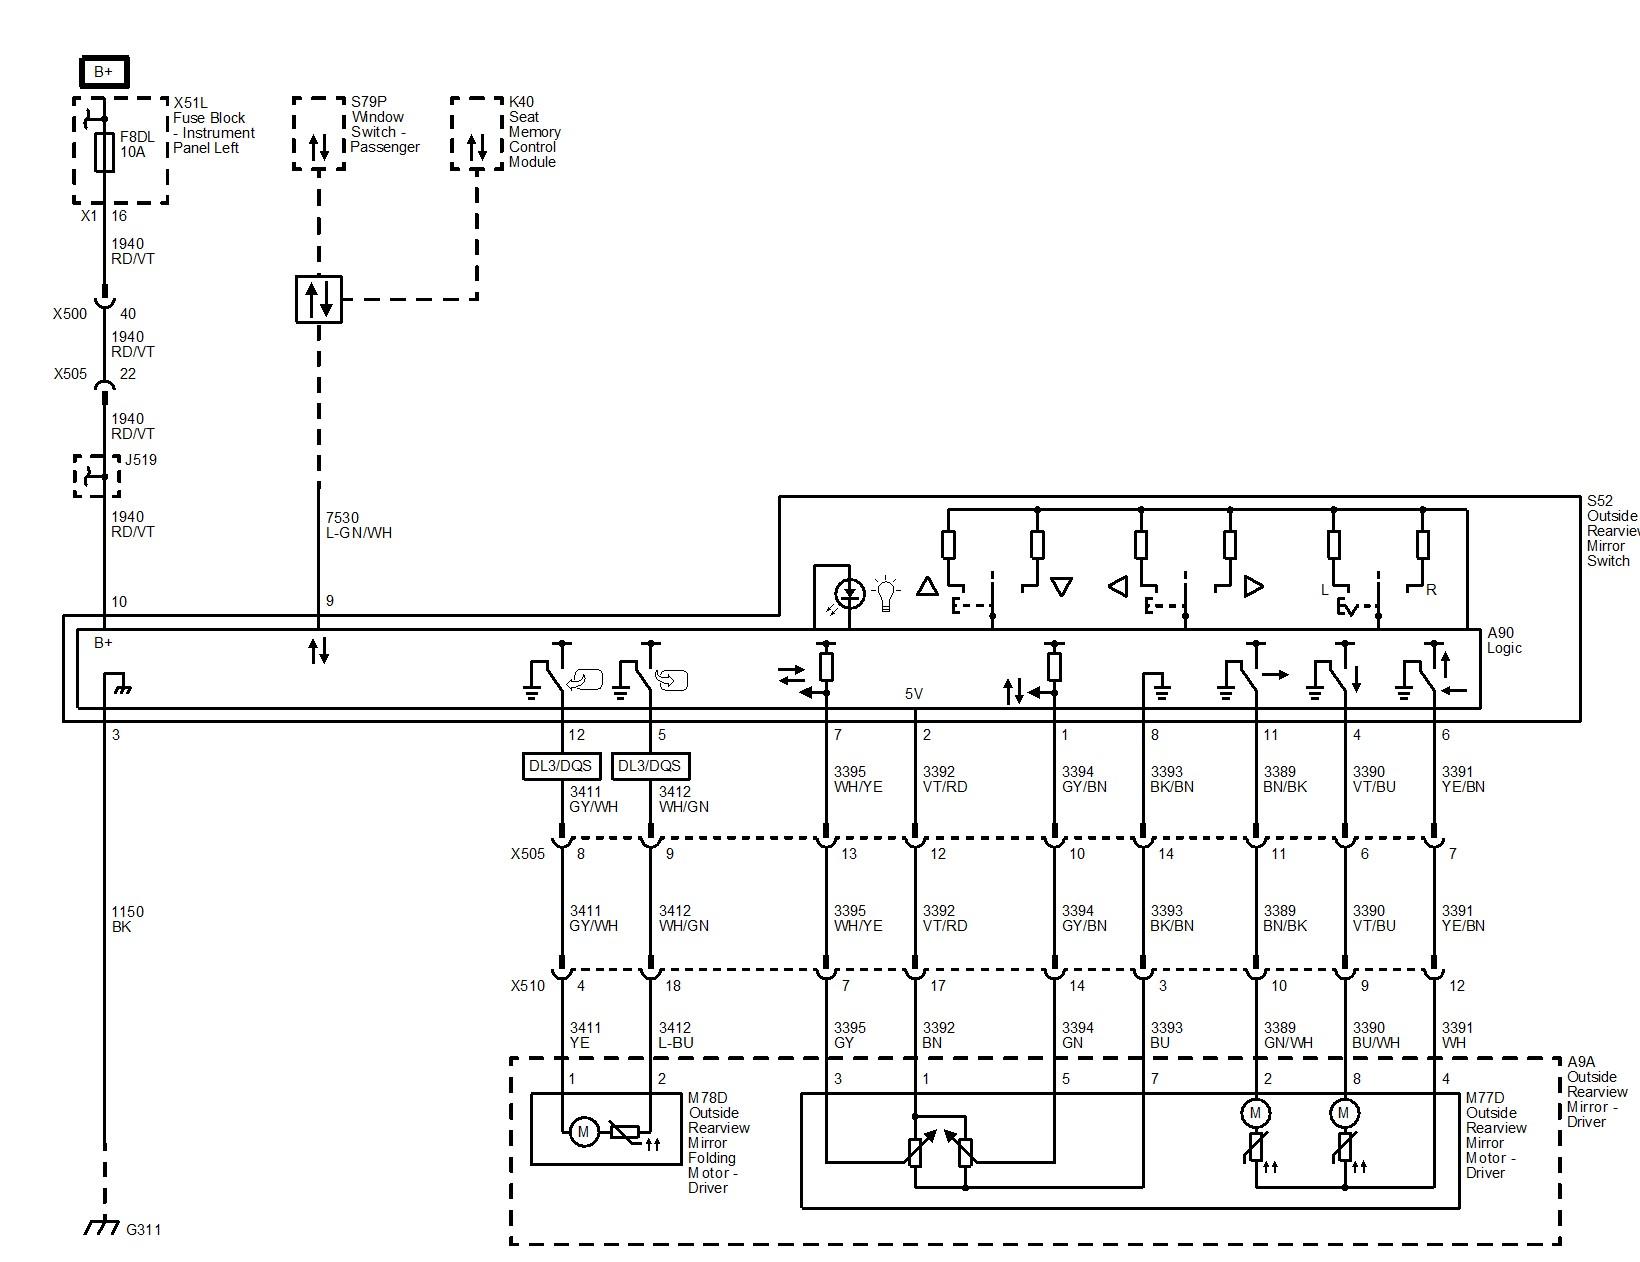 Gentex Mirror Wiring Diagram Hn 0678] Gm Power Mirror Wiring Diagram Of Gentex Mirror Wiring Diagram